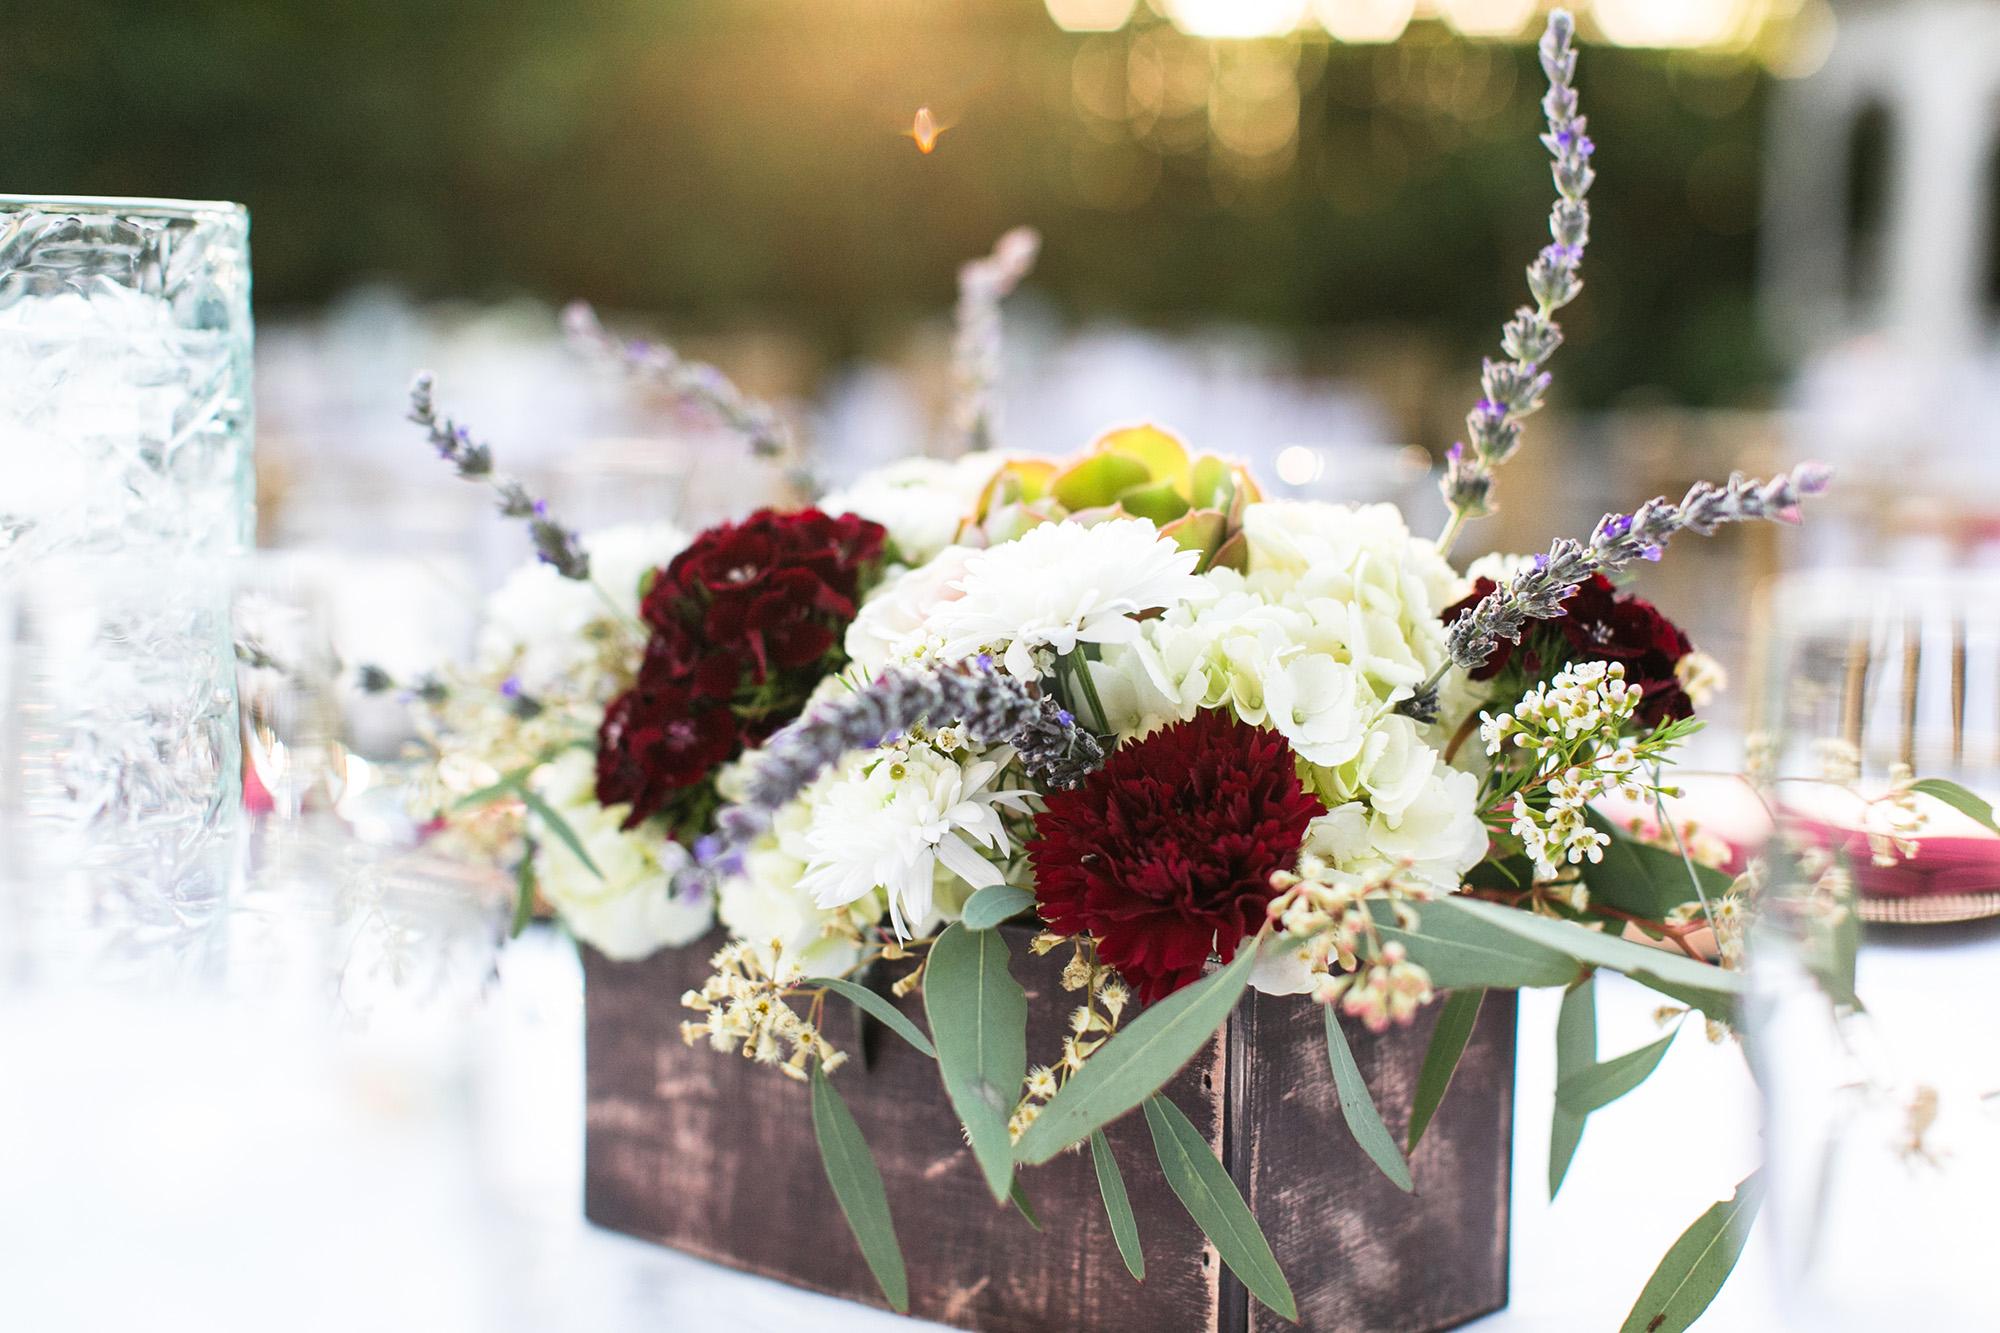 associate-photographer-christmas-house-wedding-carrie-vines-0084.jpg